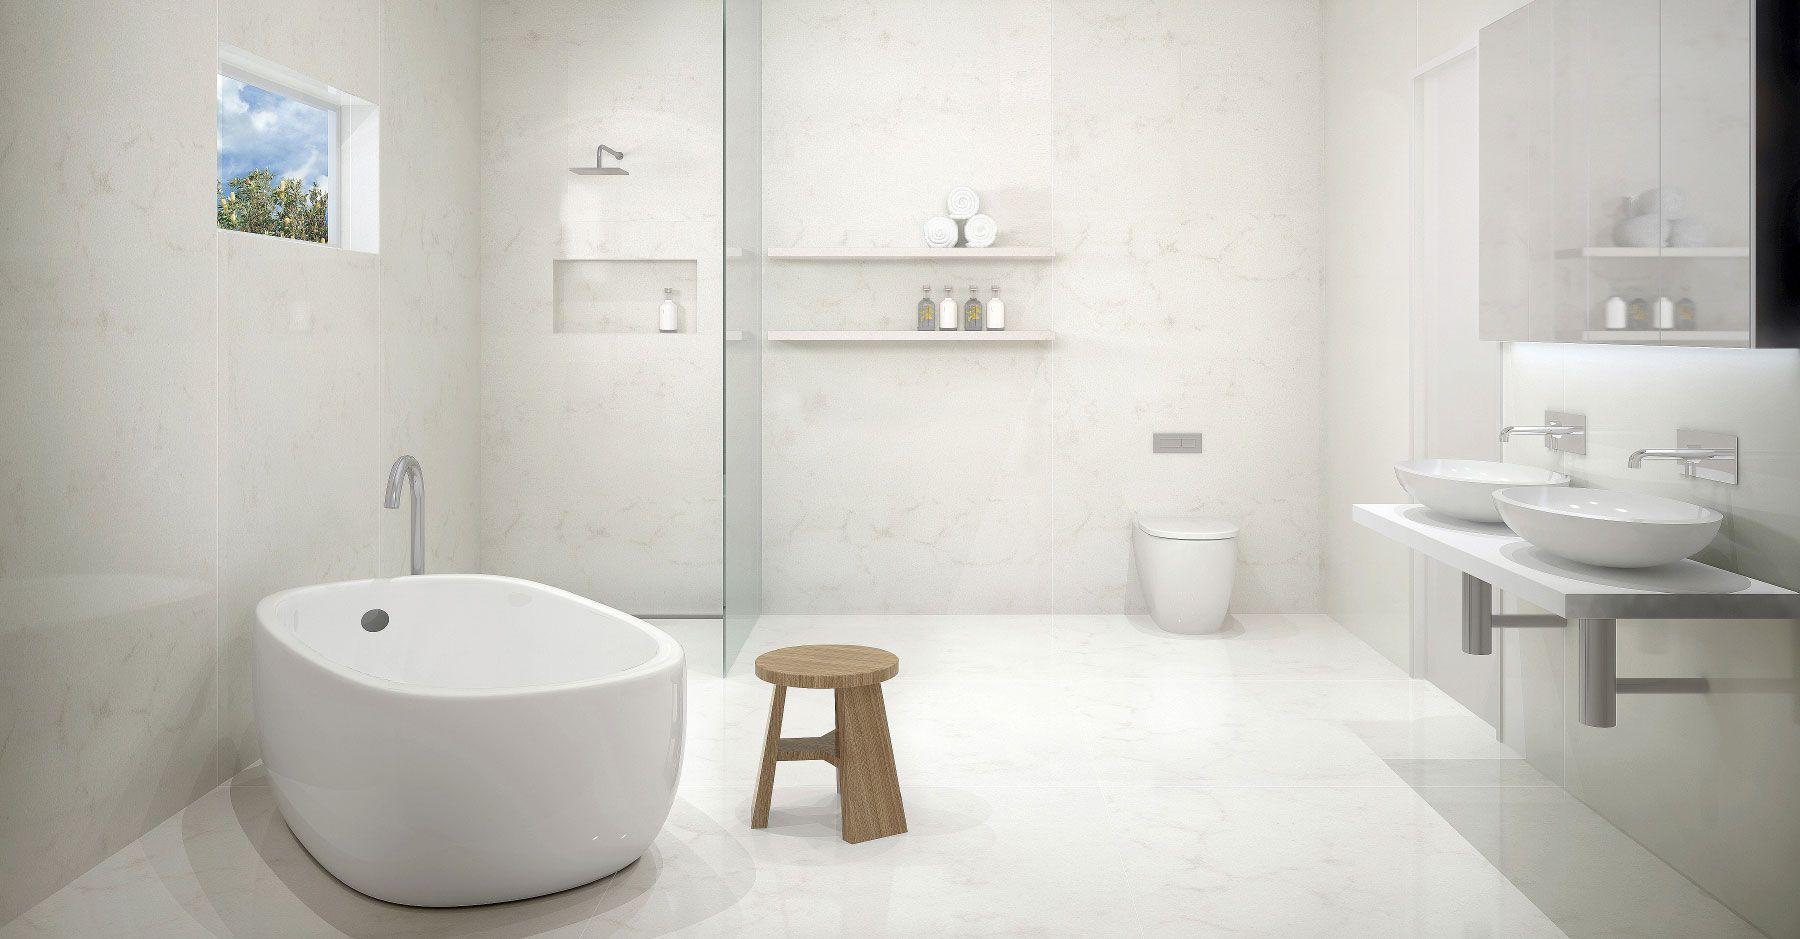 5 Reasons To Use Caesarstone In The Bathroom Fugenloses Bad Badezimmer Dekor Badezimmer Innenausstattung